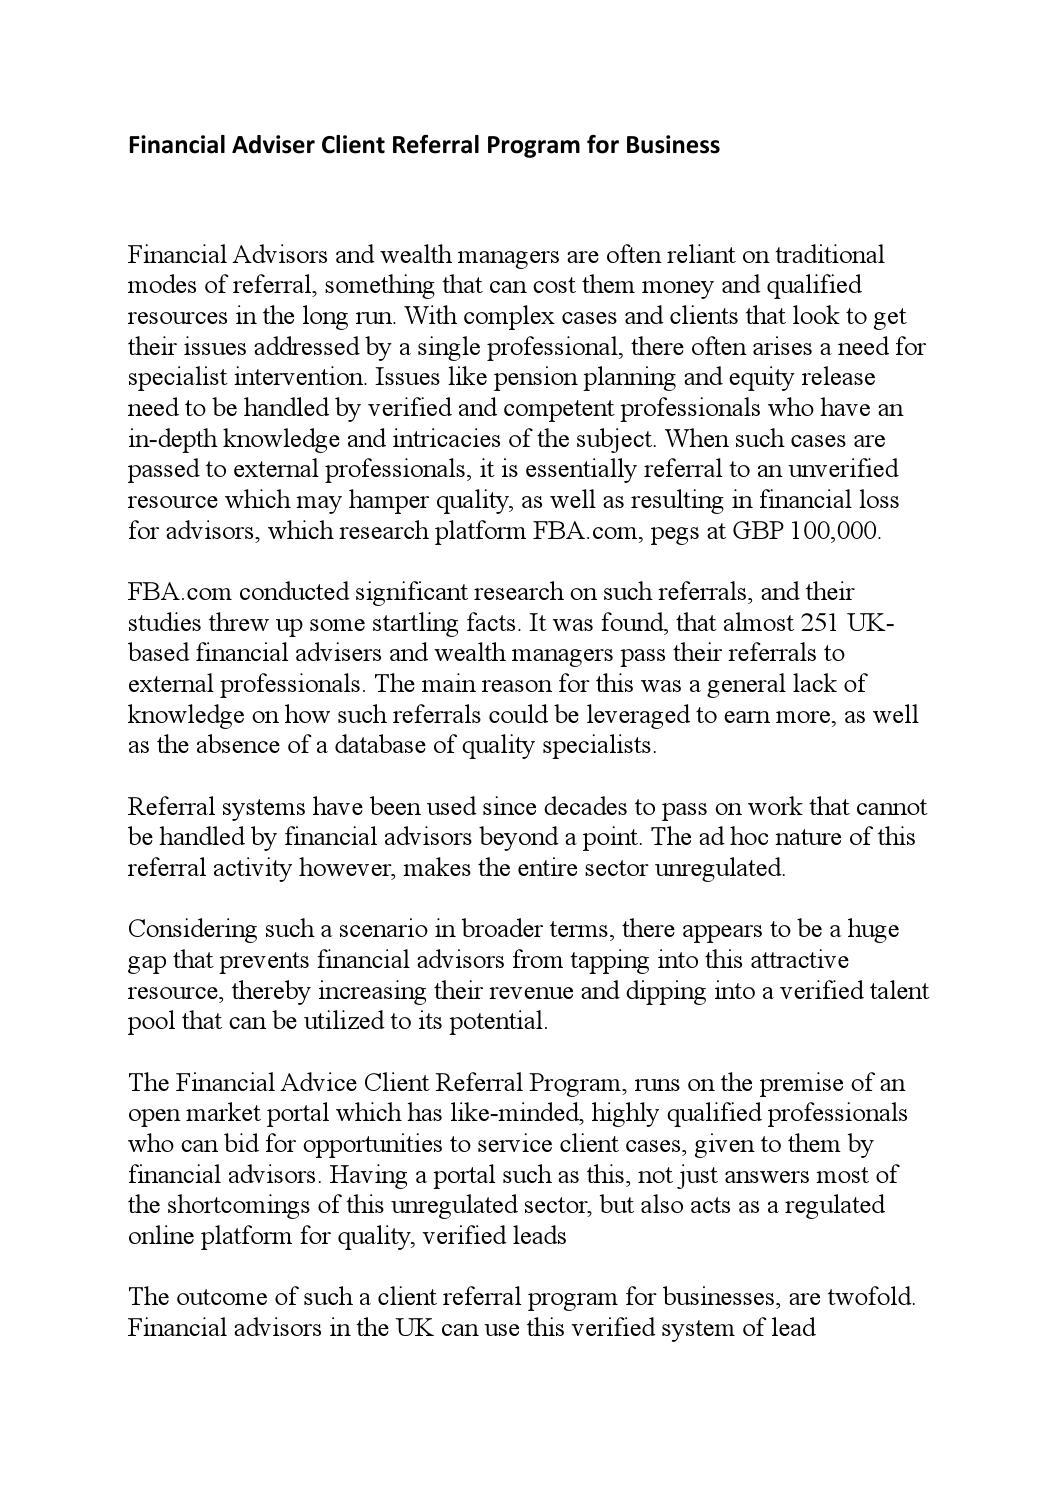 Financial adviser client referral program for business